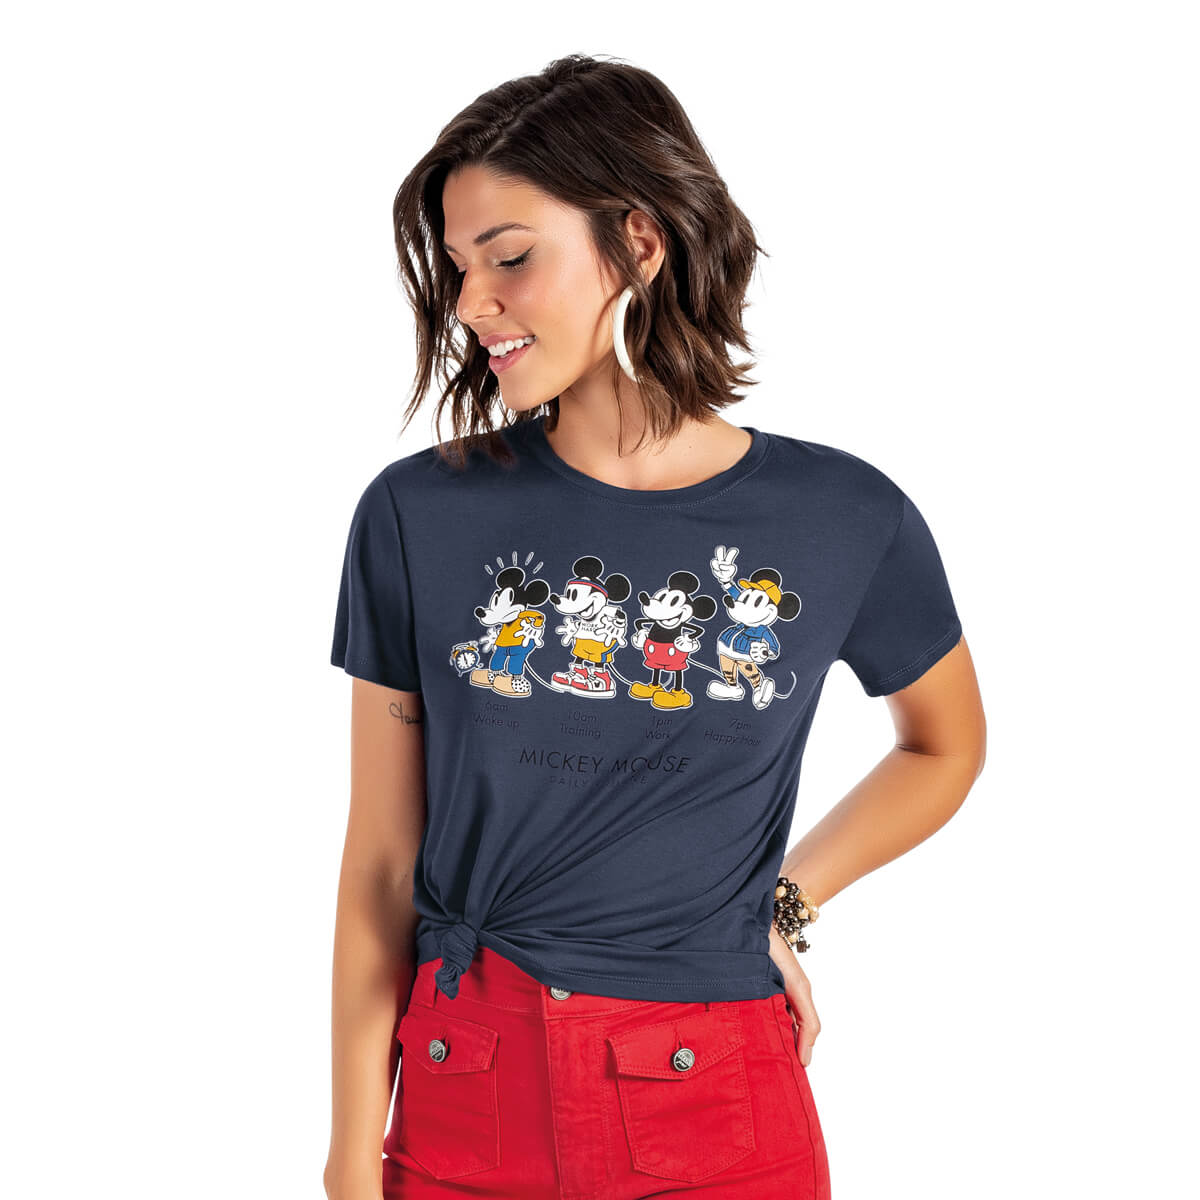 Blusa Feminina Viscolycra Mickey Mouse